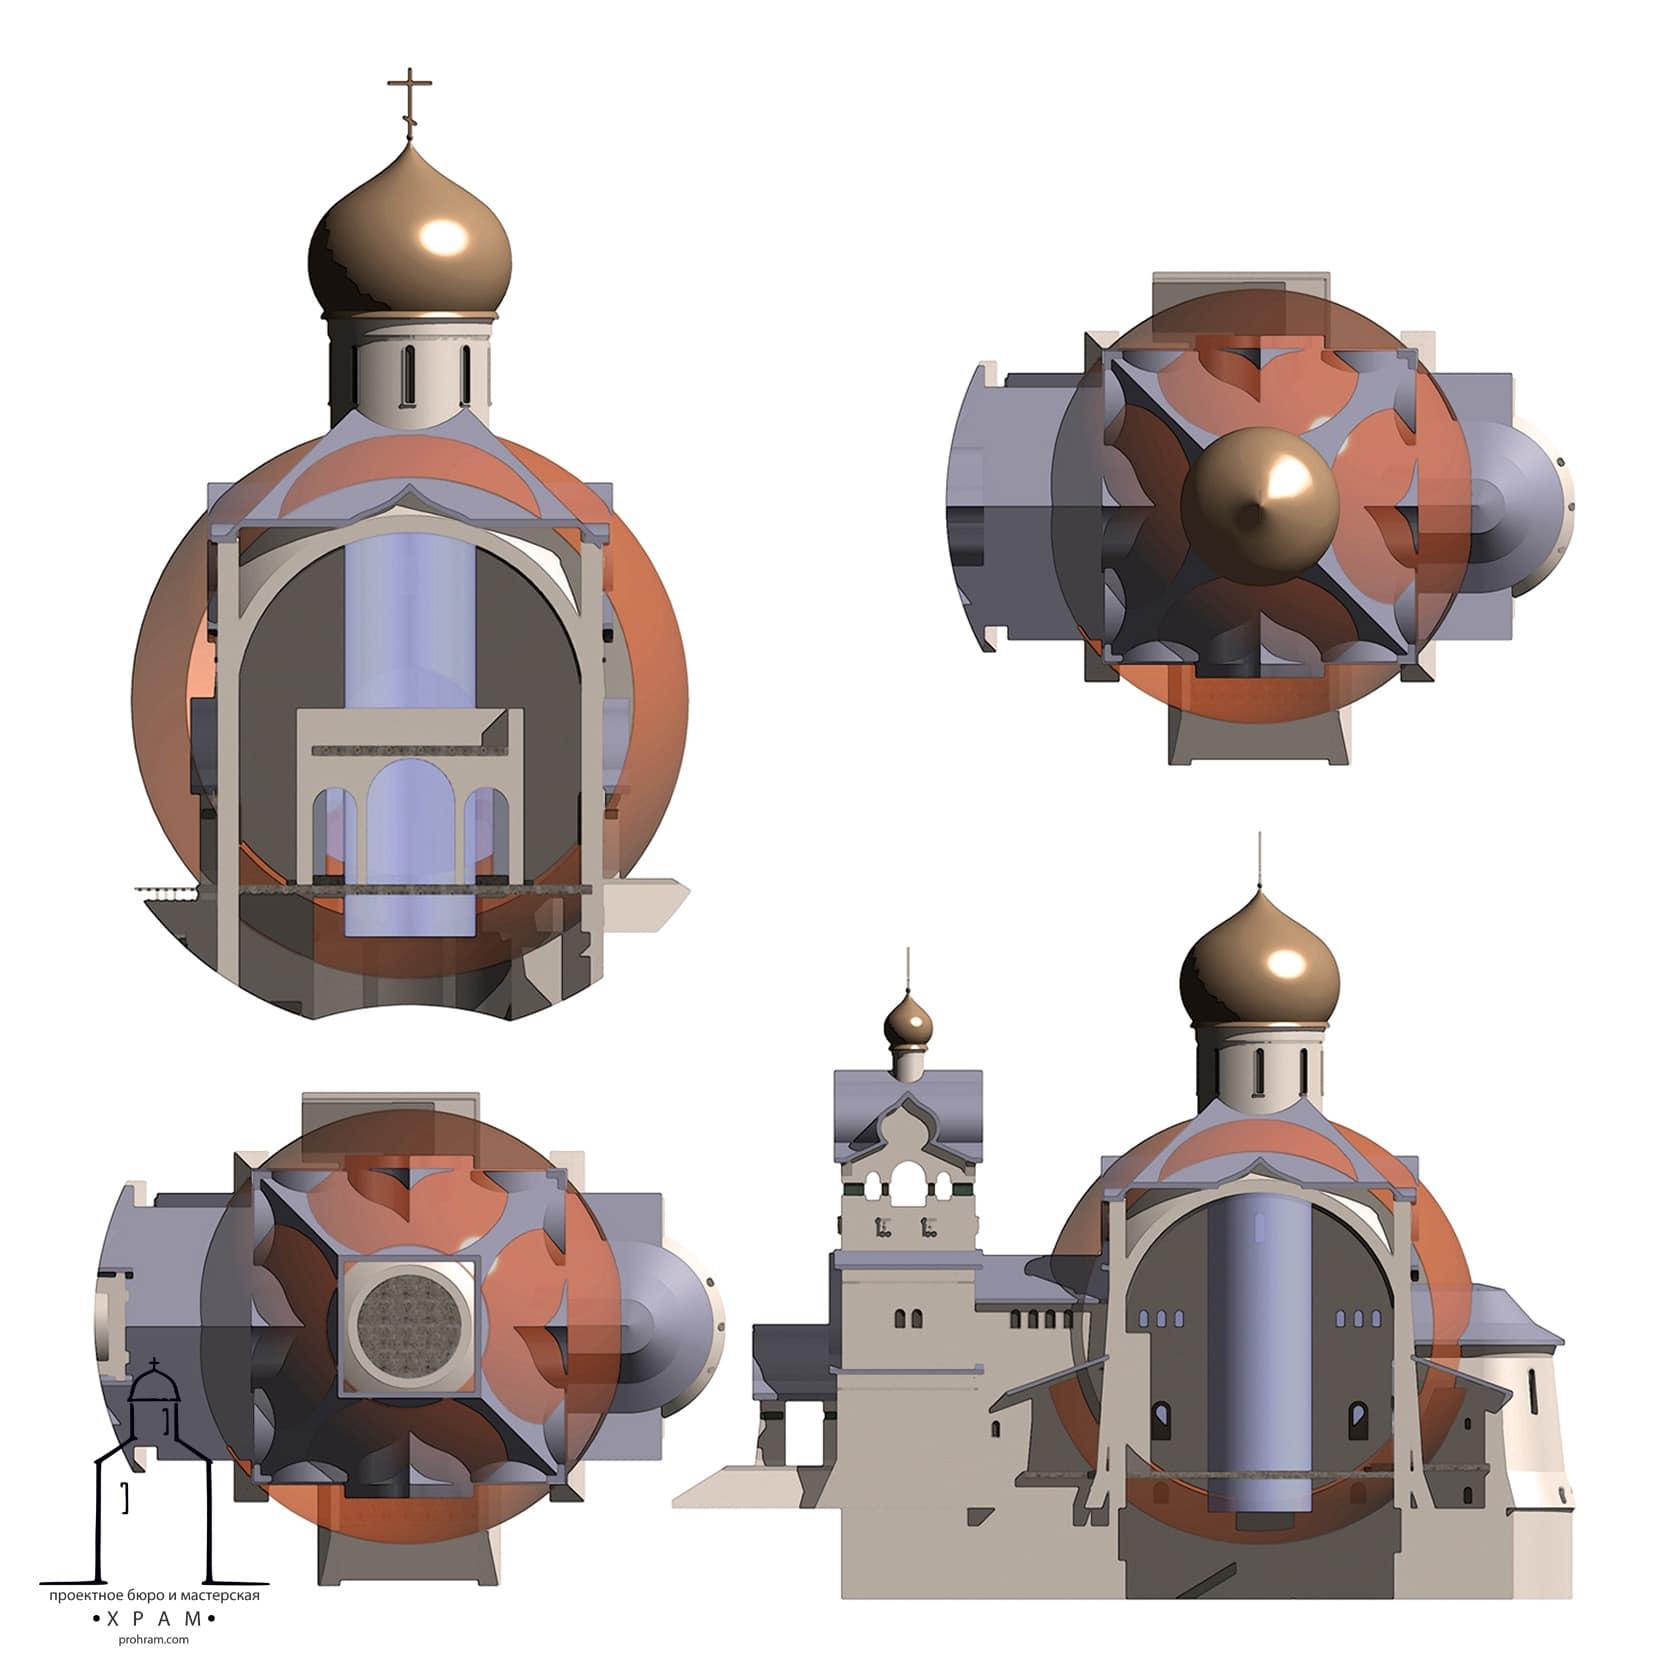 проект храма, православный храм проект, христианский храм проект, разработать проект храма,благоустройство территории храма проект, церковь проект, храм строительство, построить храм